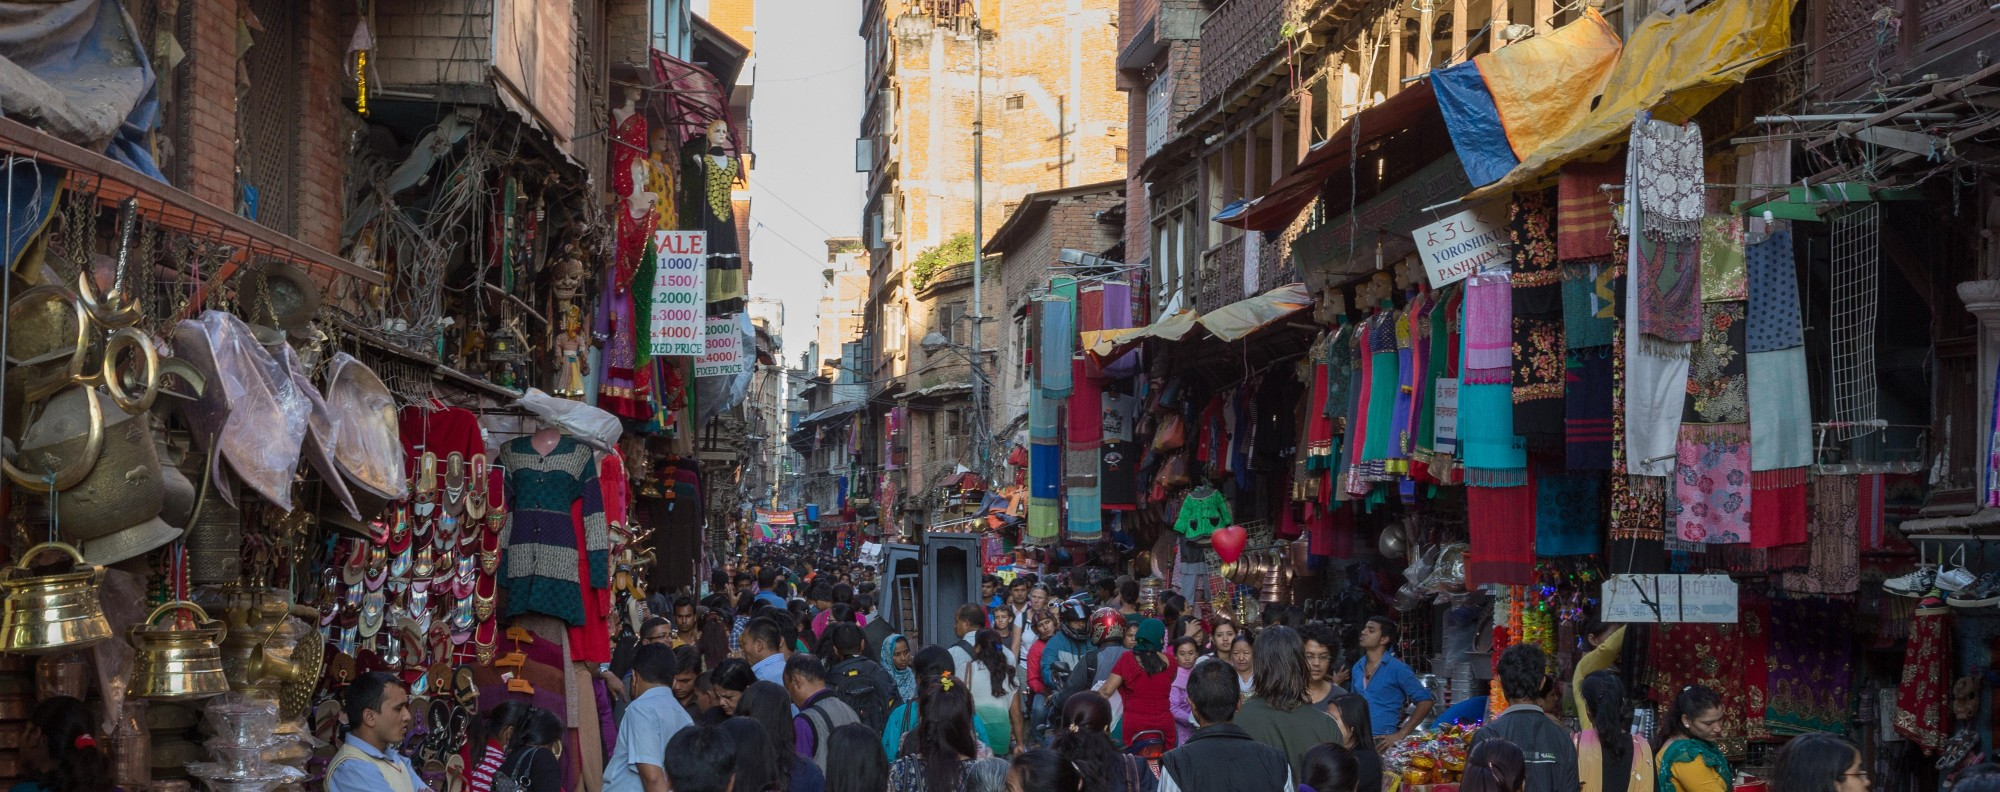 Kathmandu's bustling Thamel district.